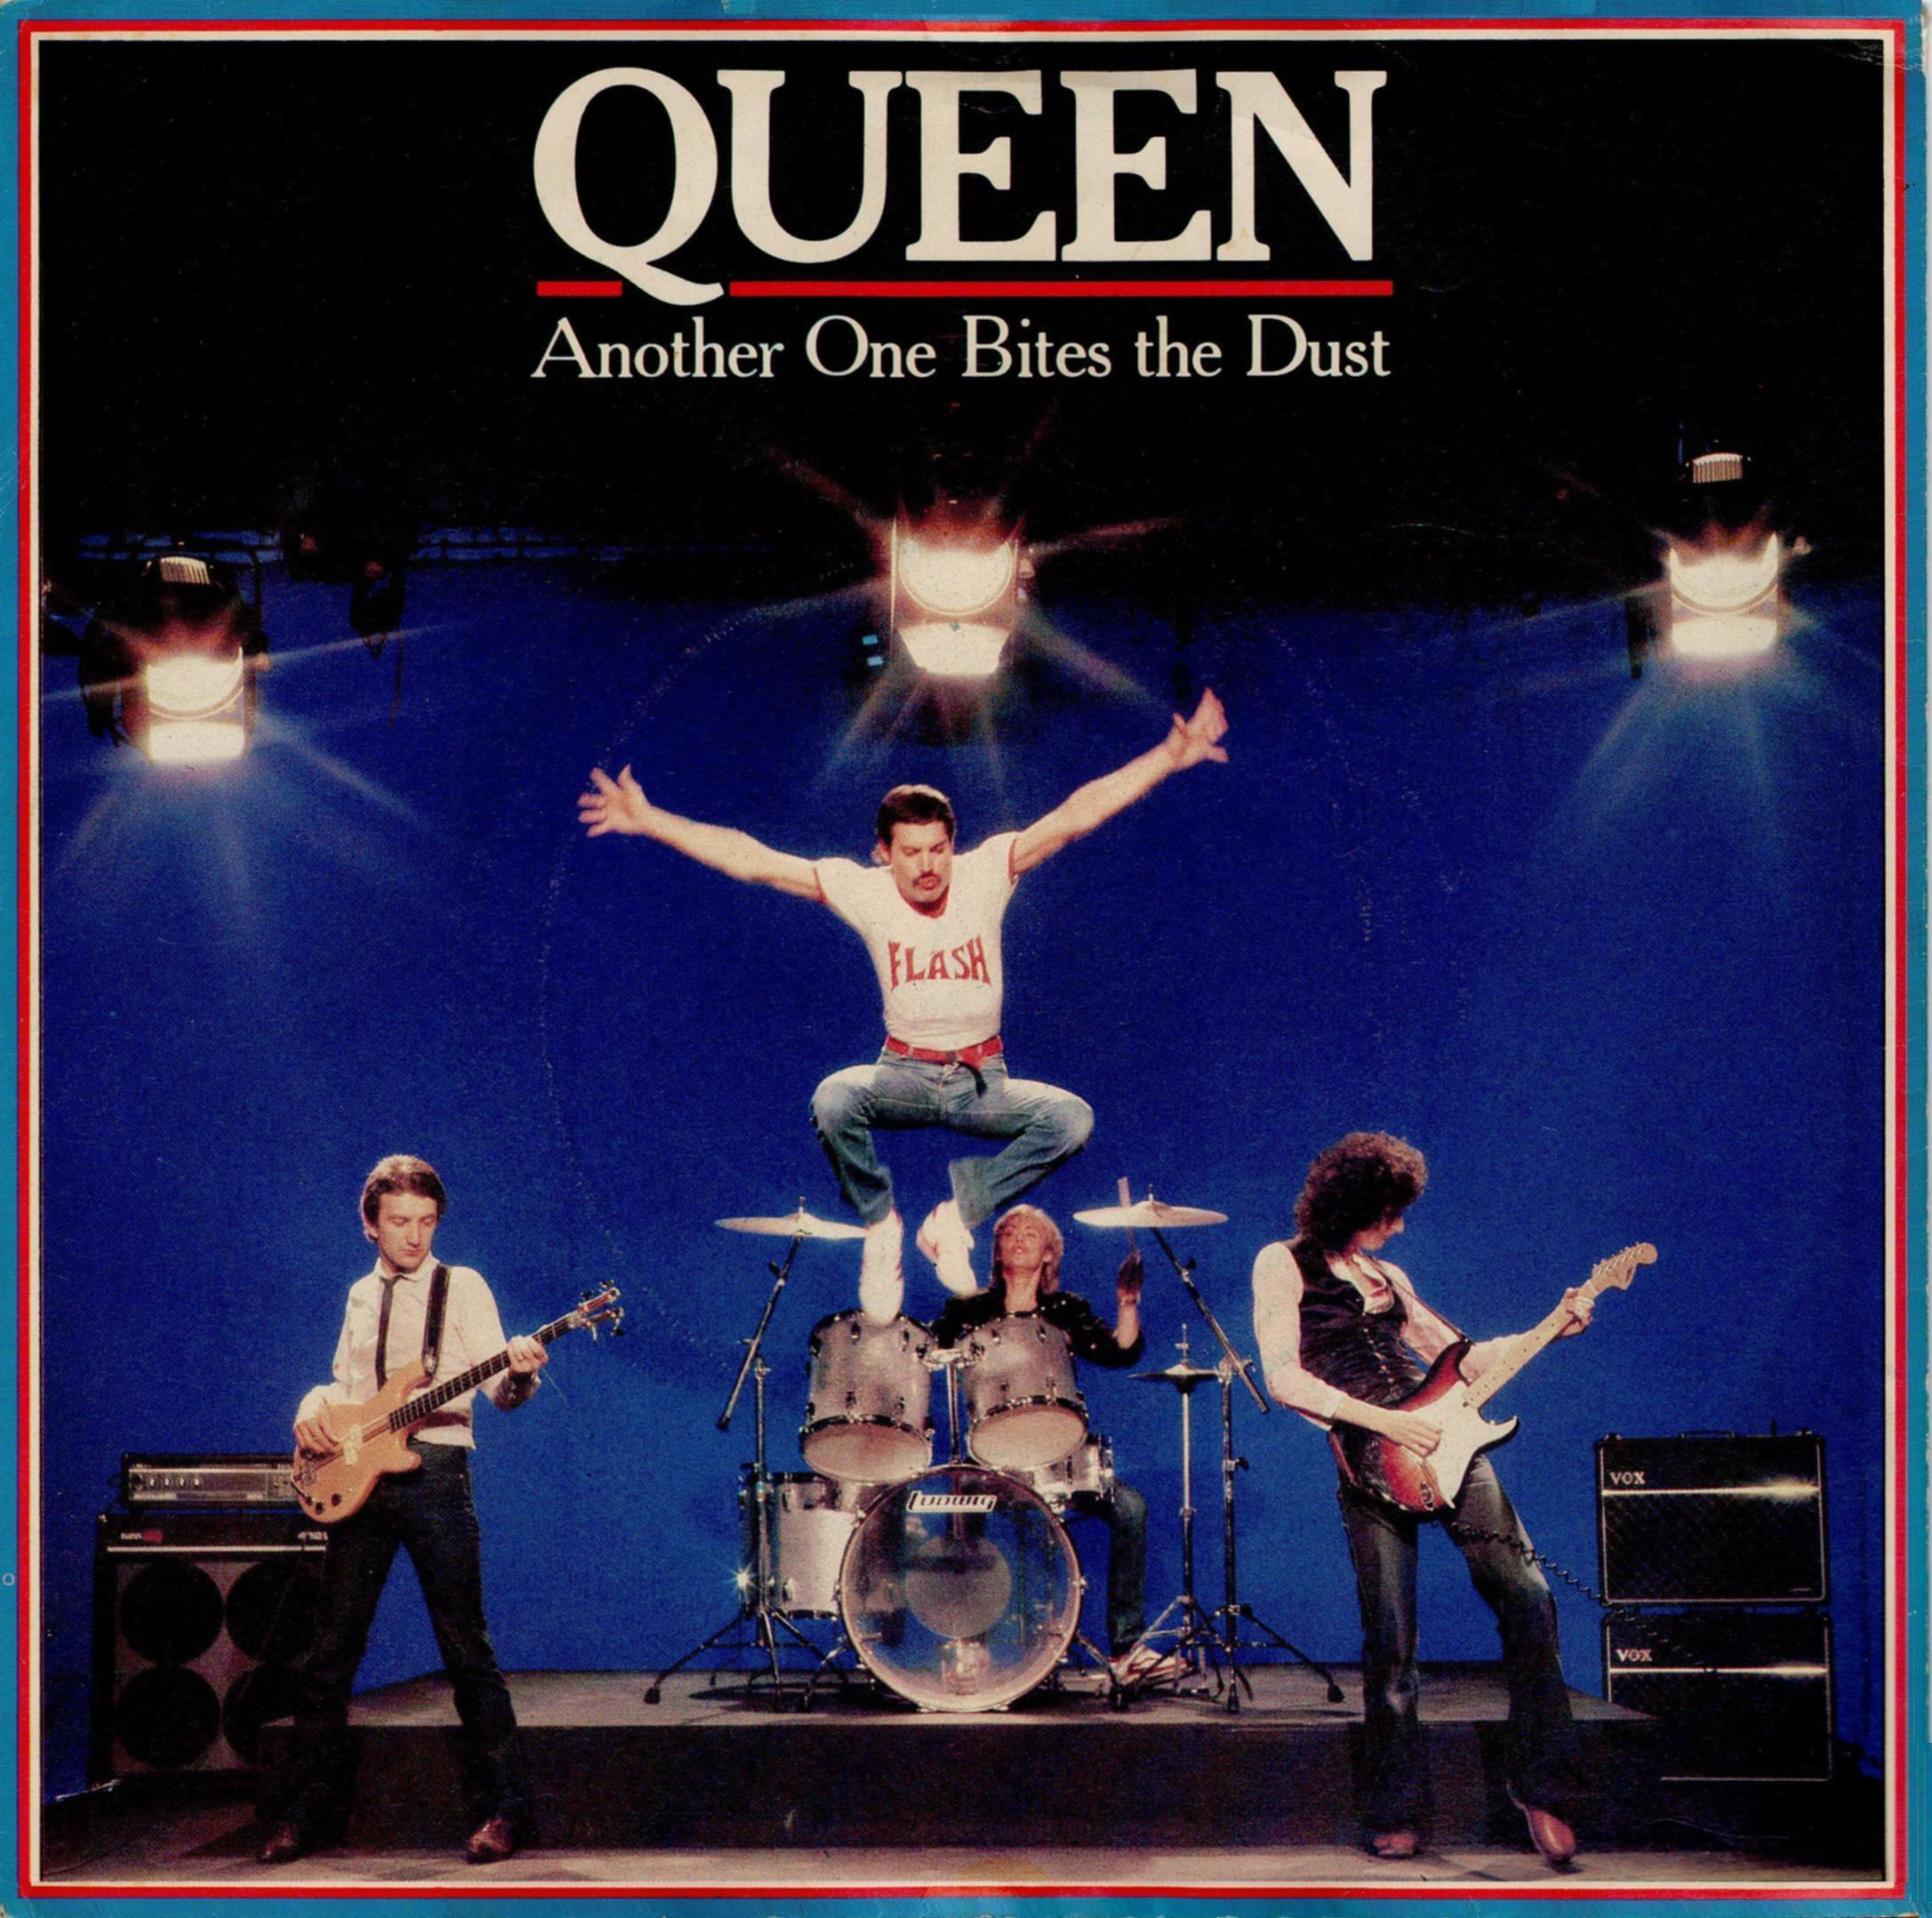 Queen - Another one bites